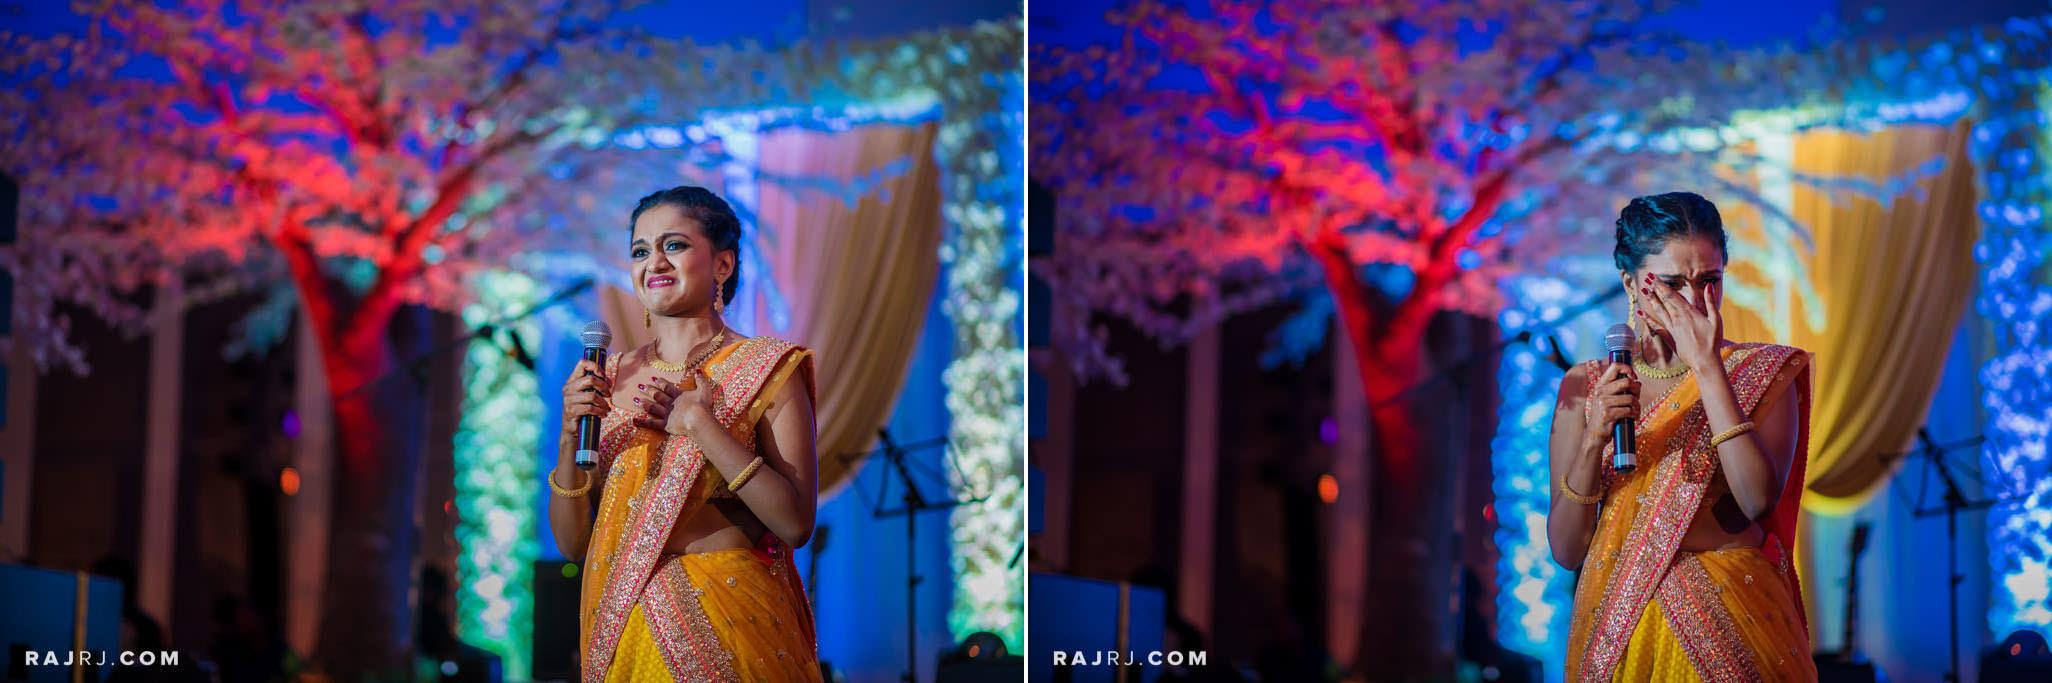 RAJ_THAILAND_WEDDING_PHOTOGRAPHY-95_1.jpg